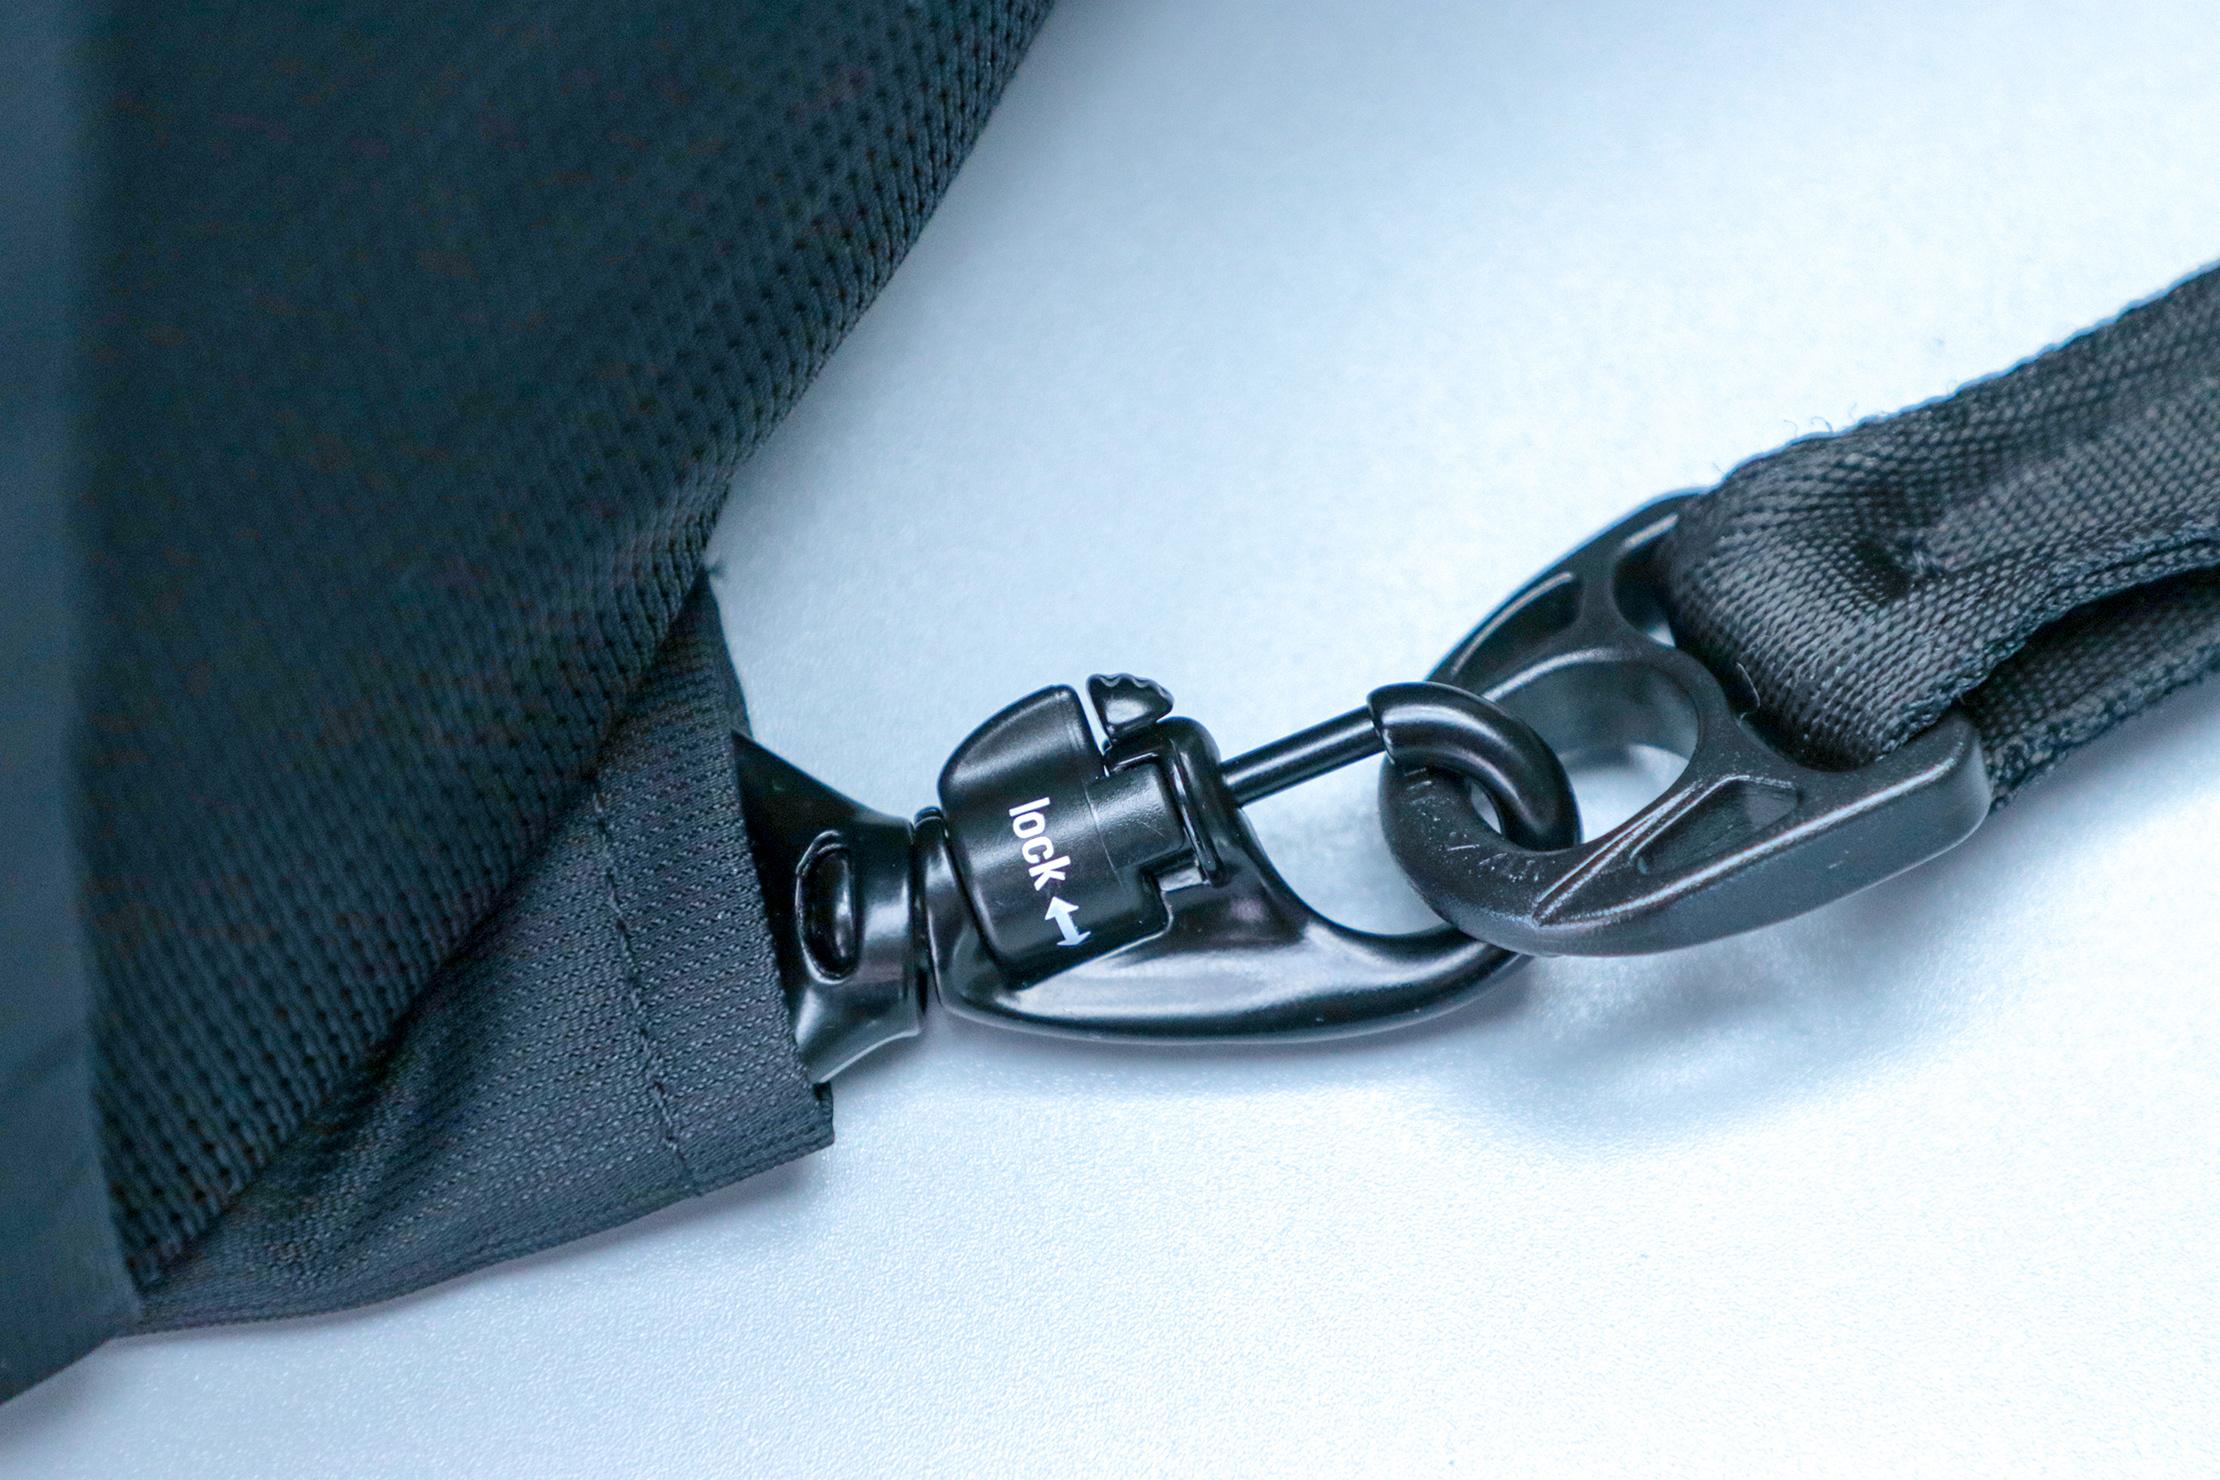 Pacsafe Metrosafe LS450 Anti-Theft Backpack Locking Clip